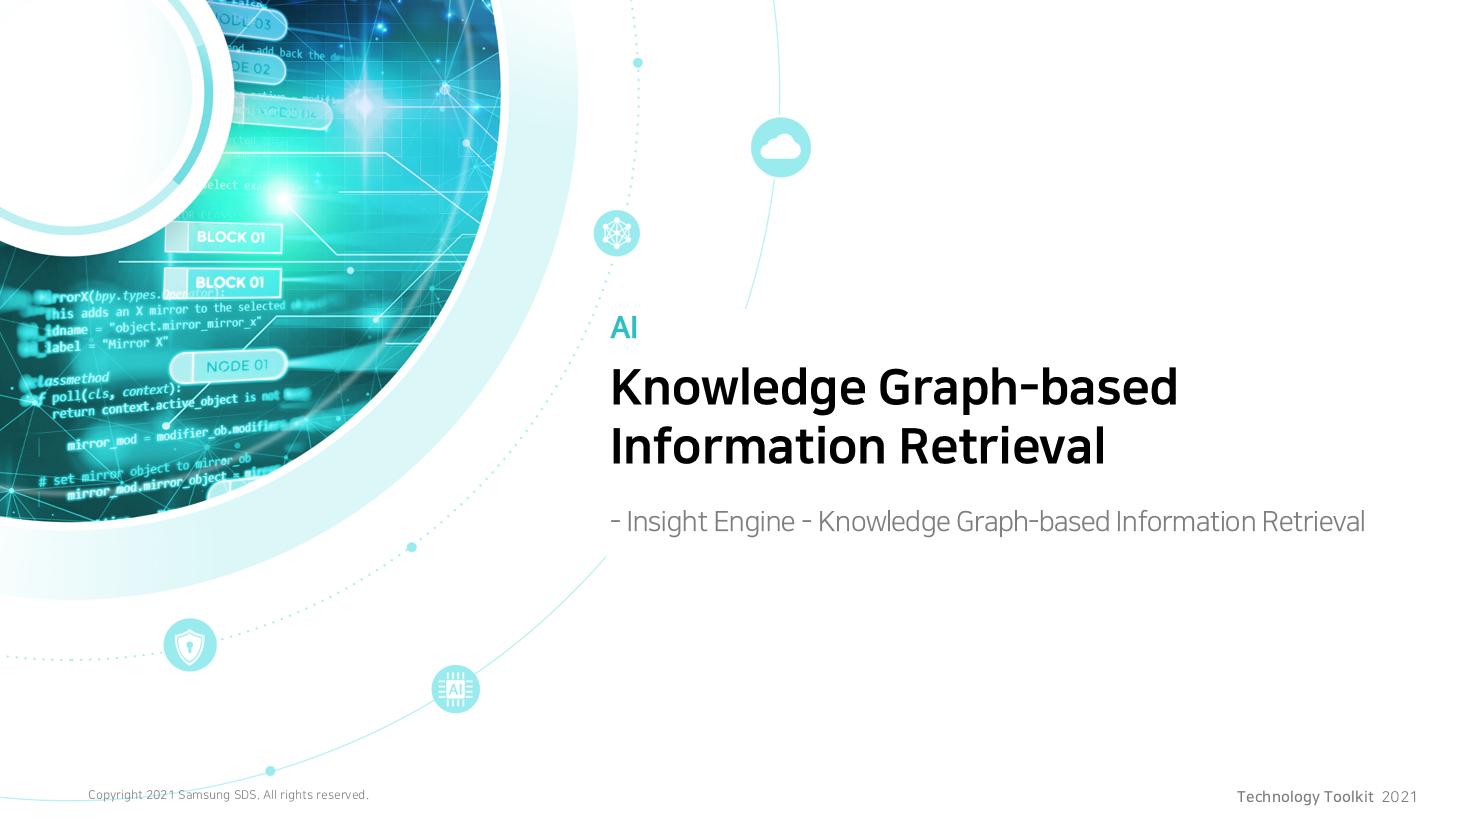 Knowledge Graph-based Information Retrieval